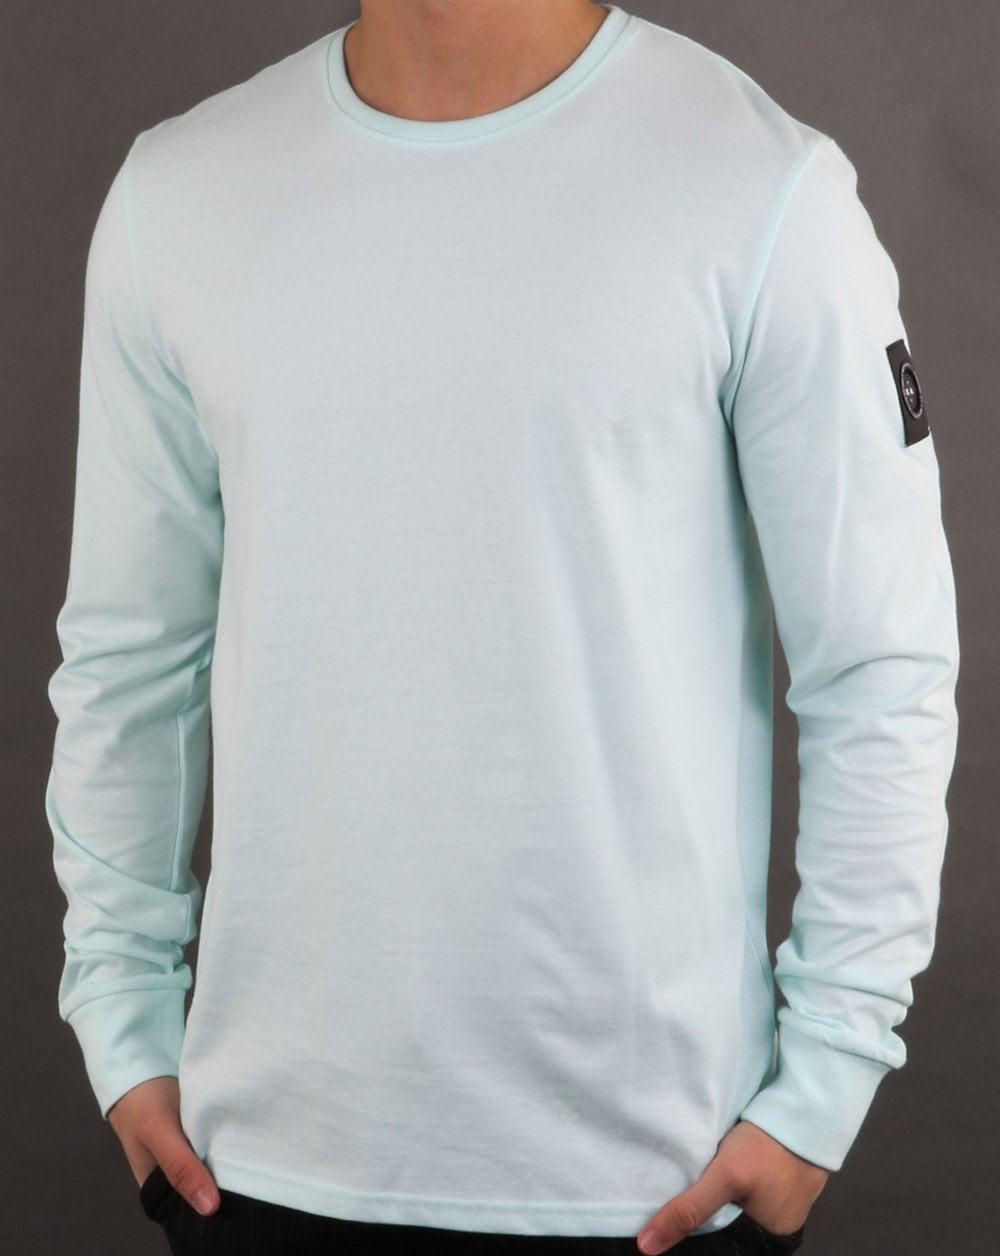 869c440fc Marshall Artist Siren Long Sleeve T-shirt Light Blue